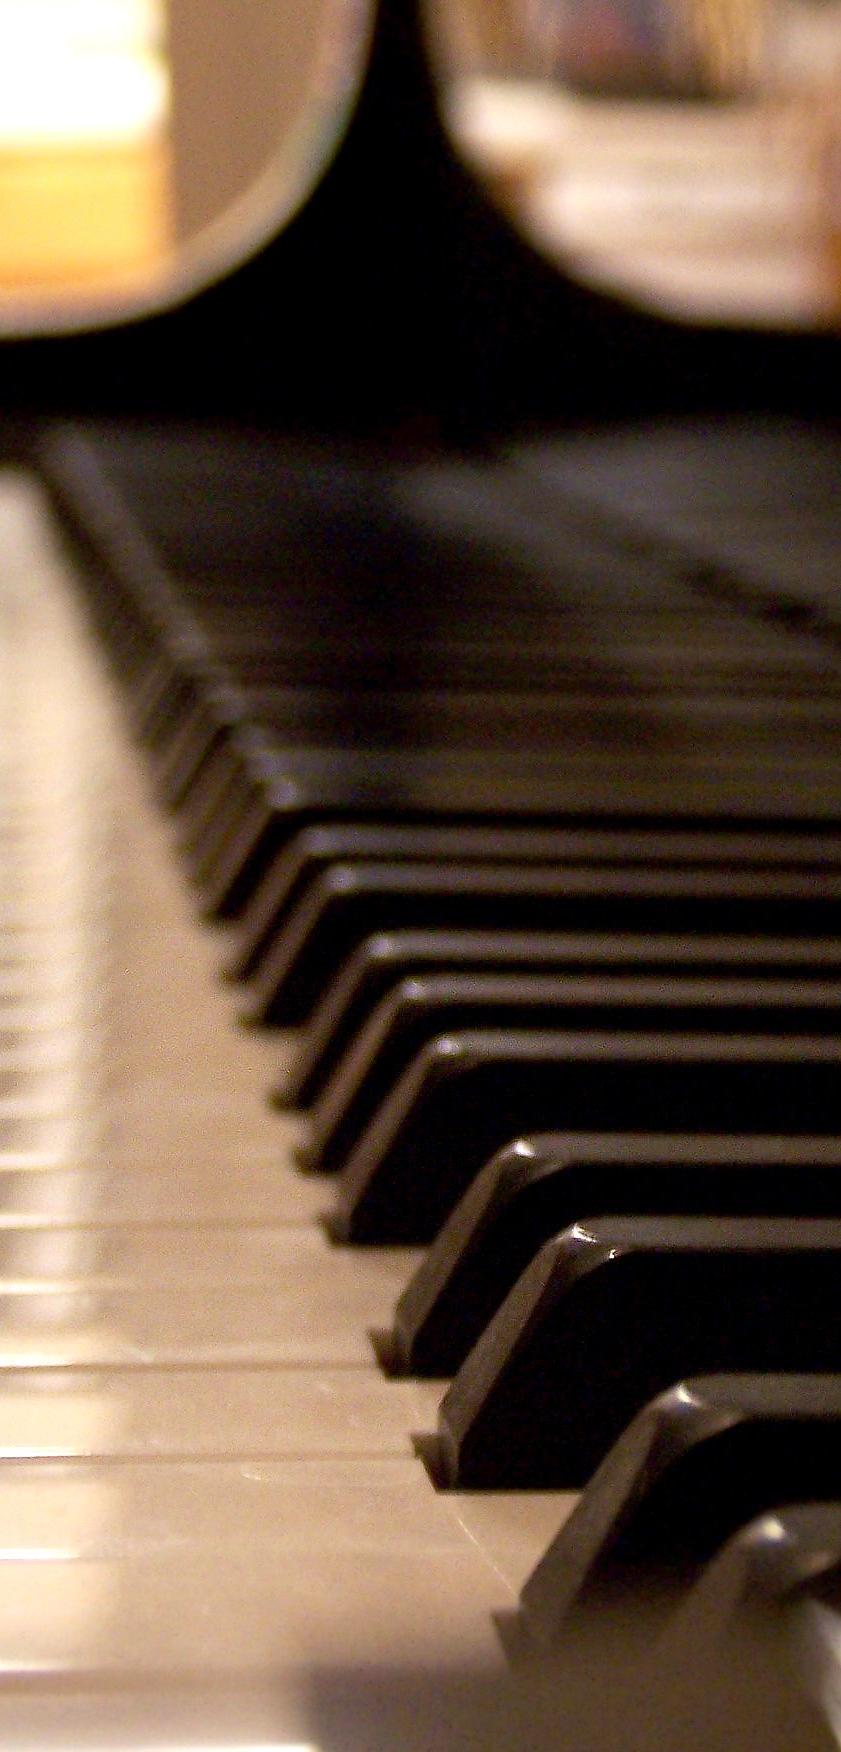 Piano_Keys_warm.jpg